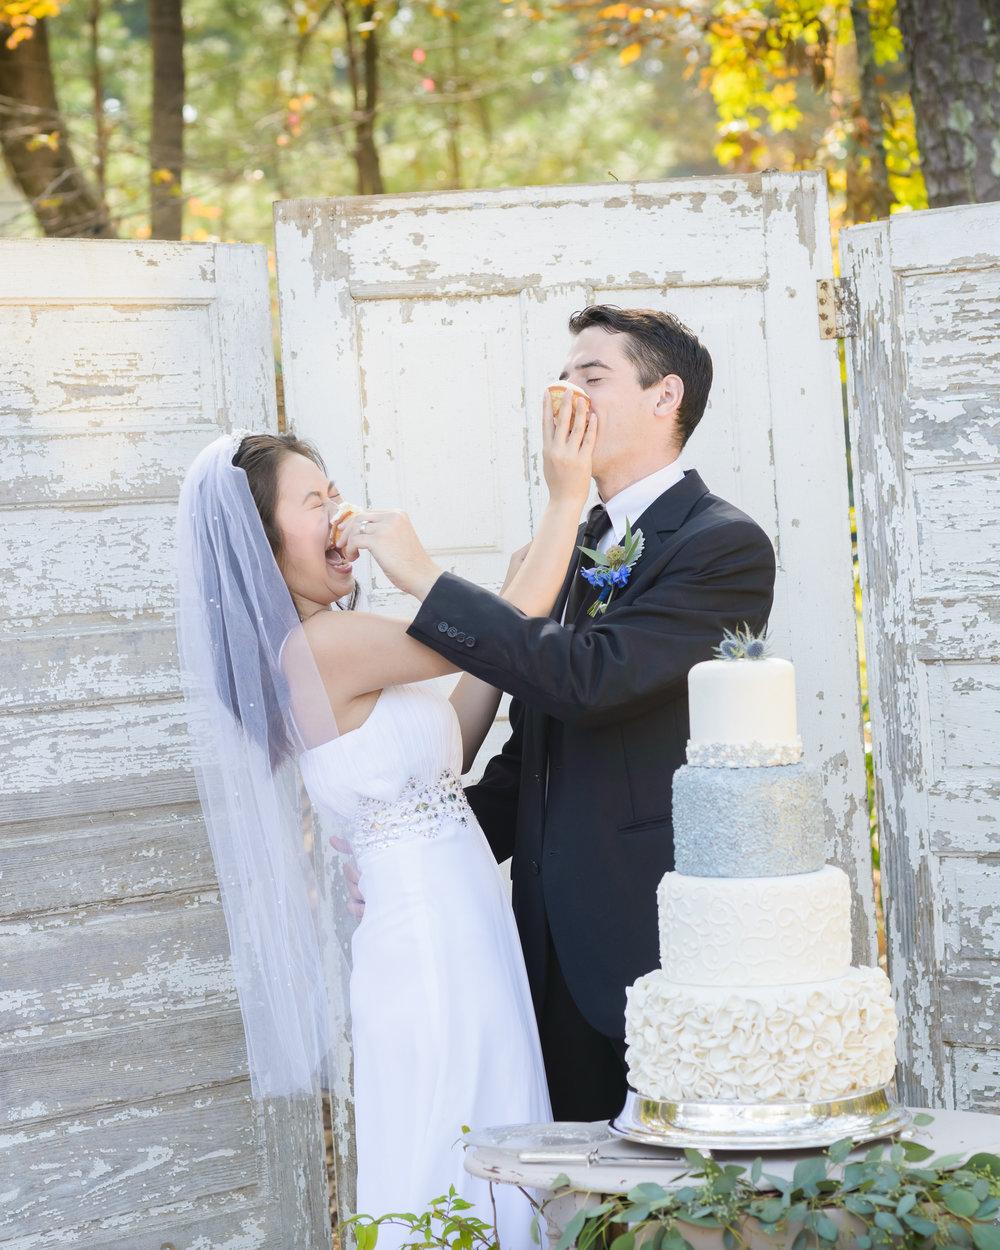 cake cutting wedding ceremony